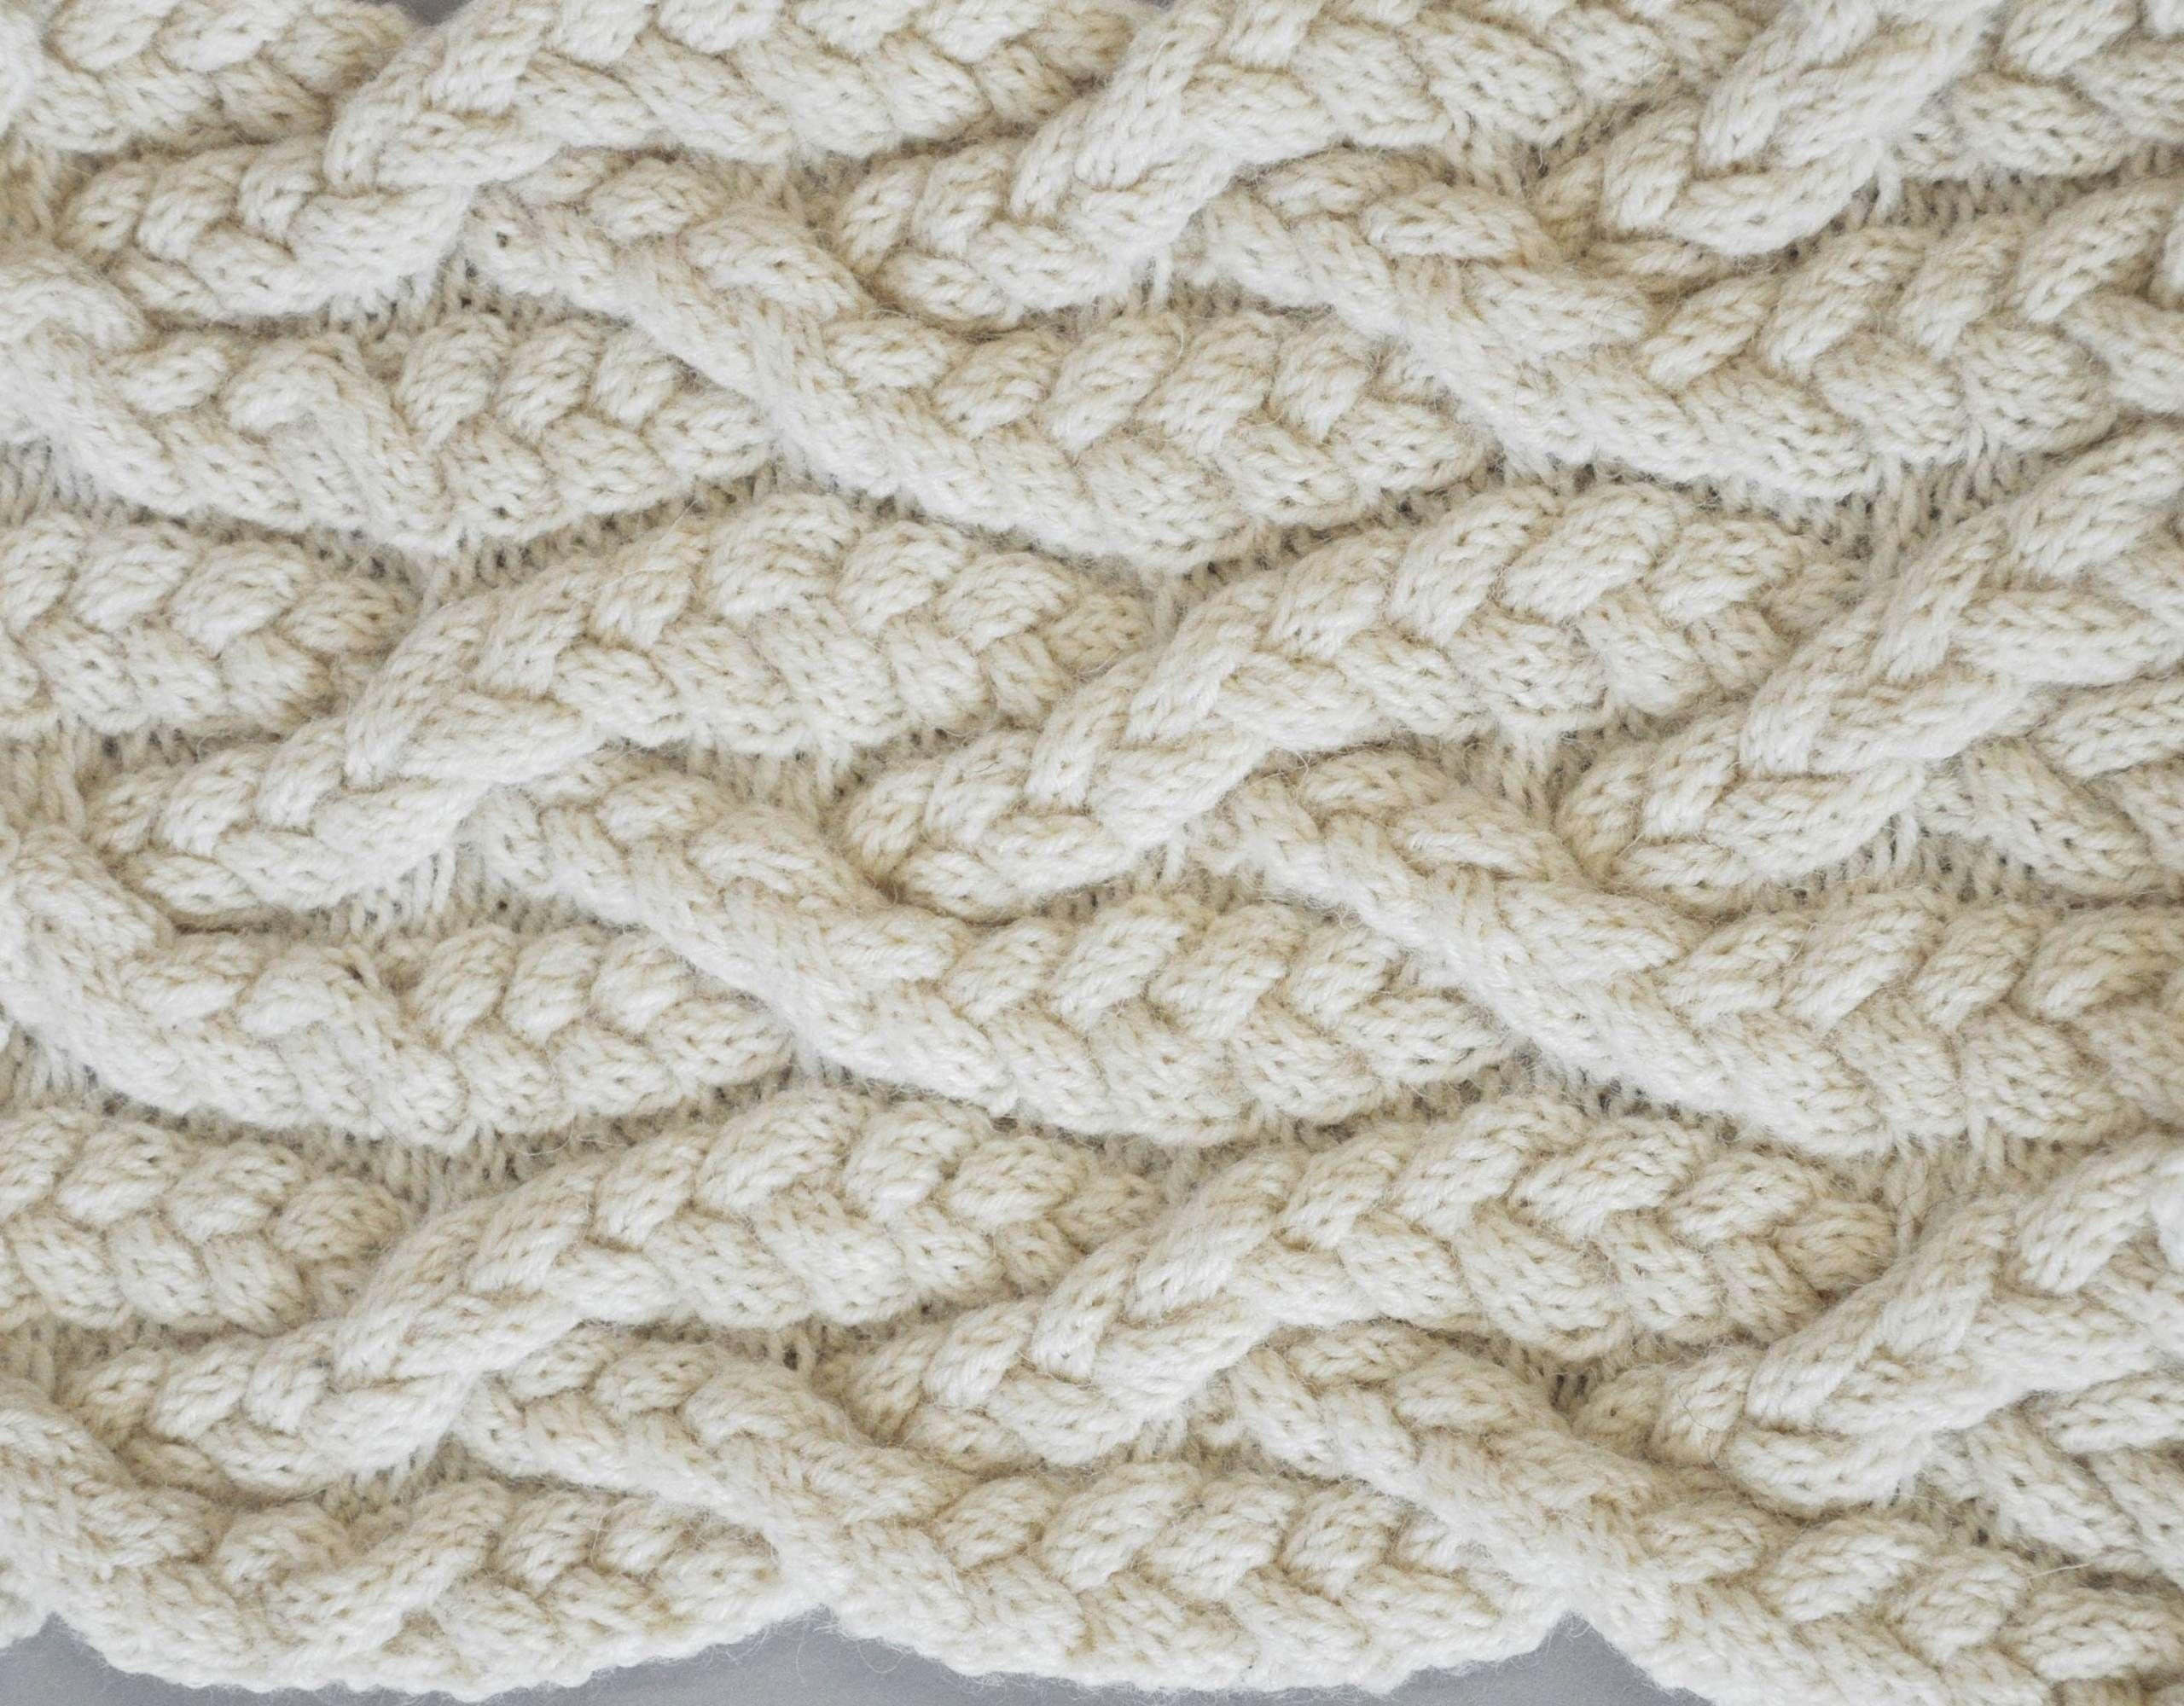 British wool : an exploration of Structure & Fibre | Textura, Tejido ...